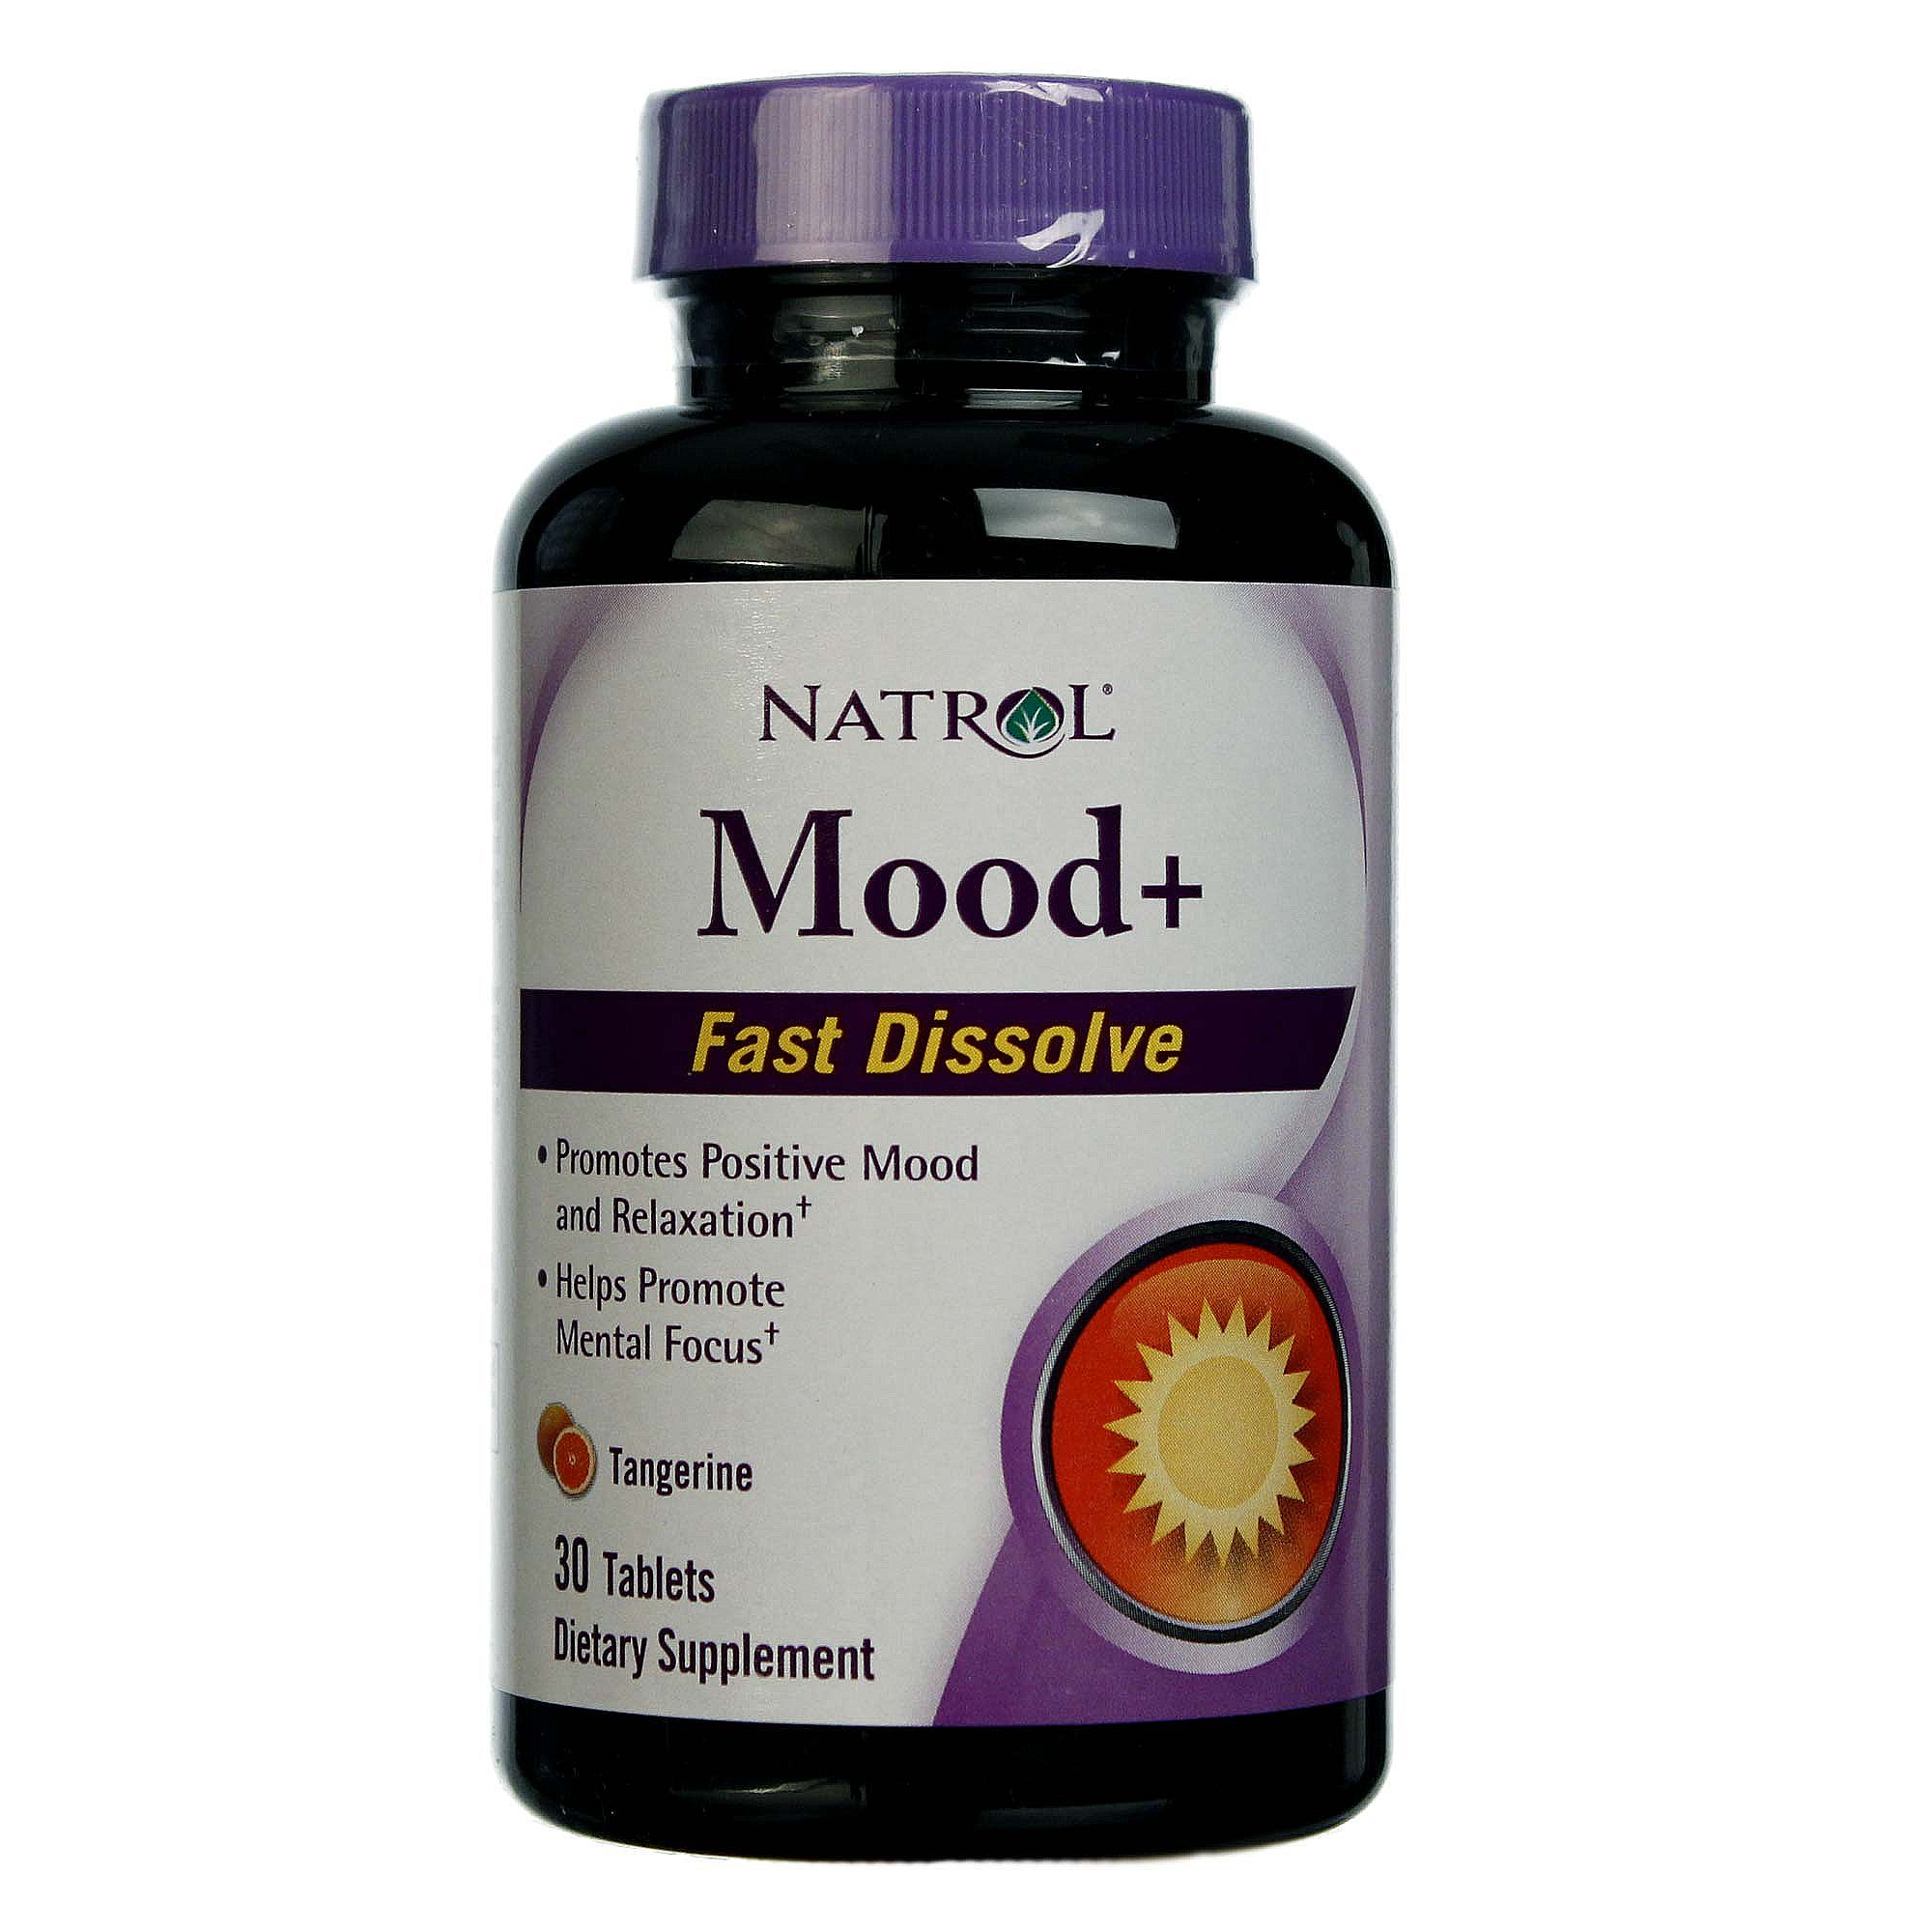 NATROL - Mood Positive 5 HTP - 50 Tablets